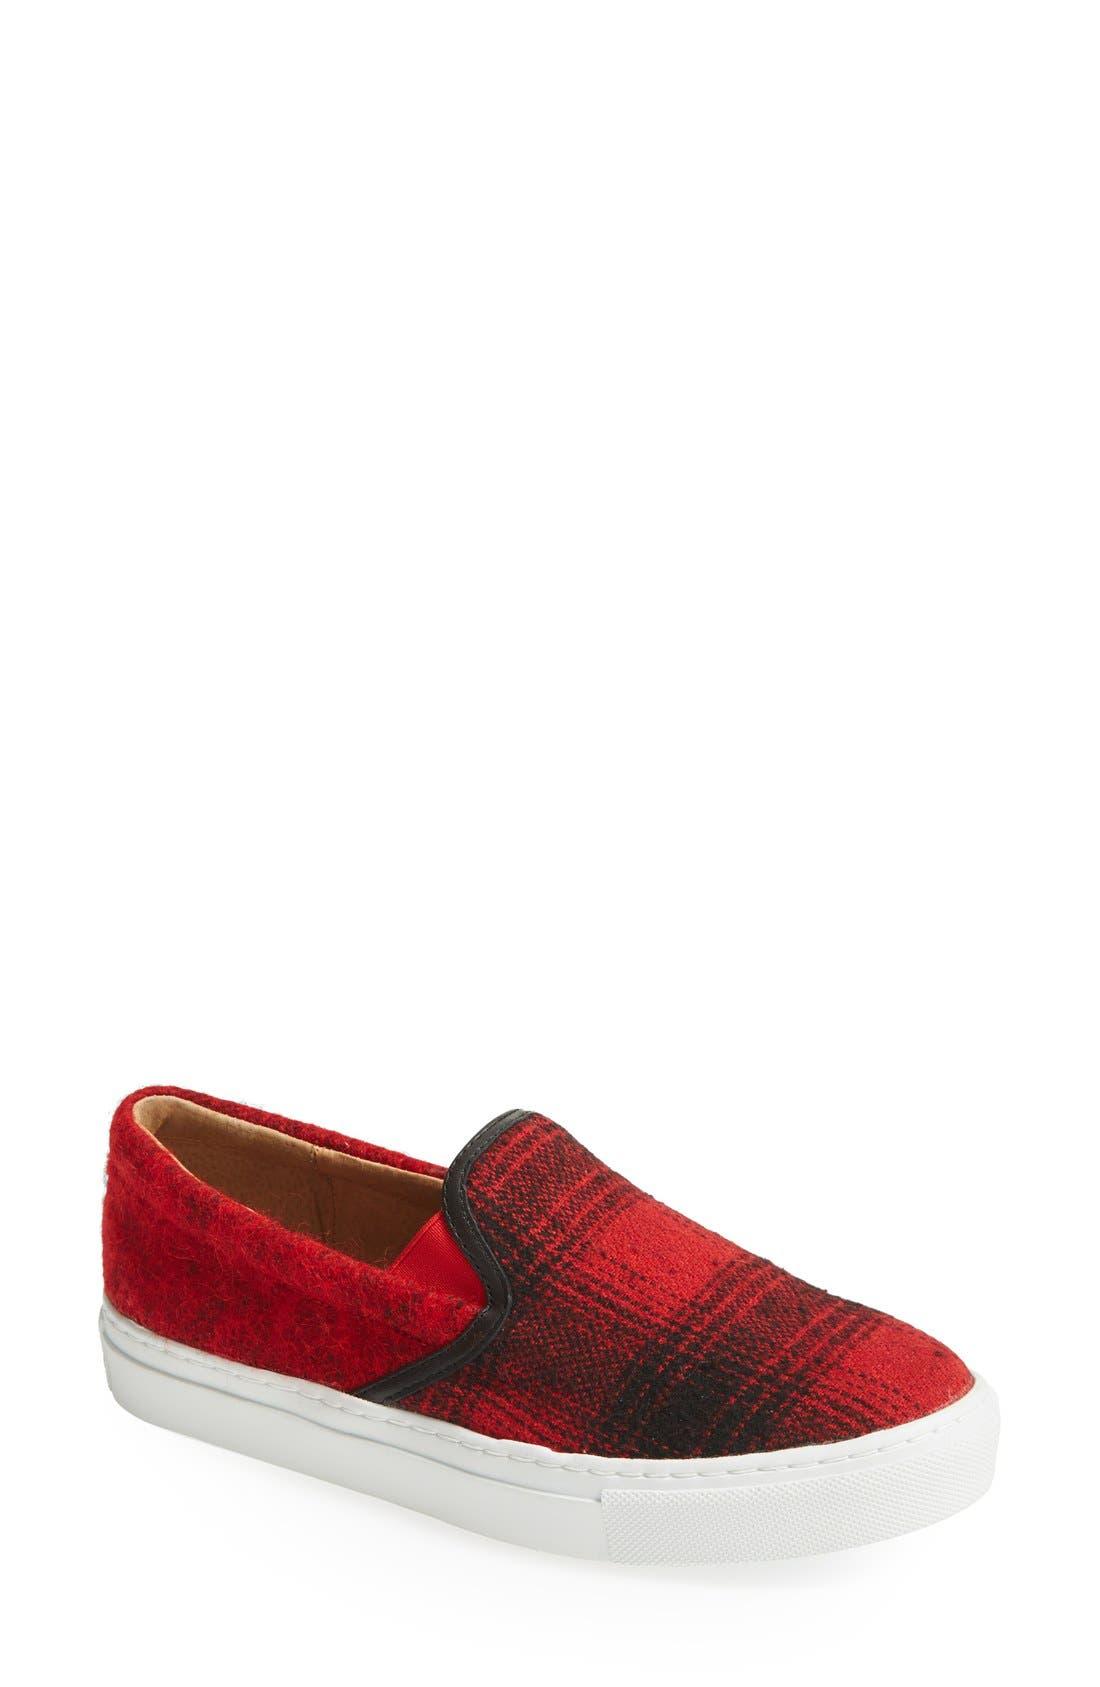 Alternate Image 1 Selected - Bettye by Bettye Muller 'Bentley' Slip-On Sneaker (Women)